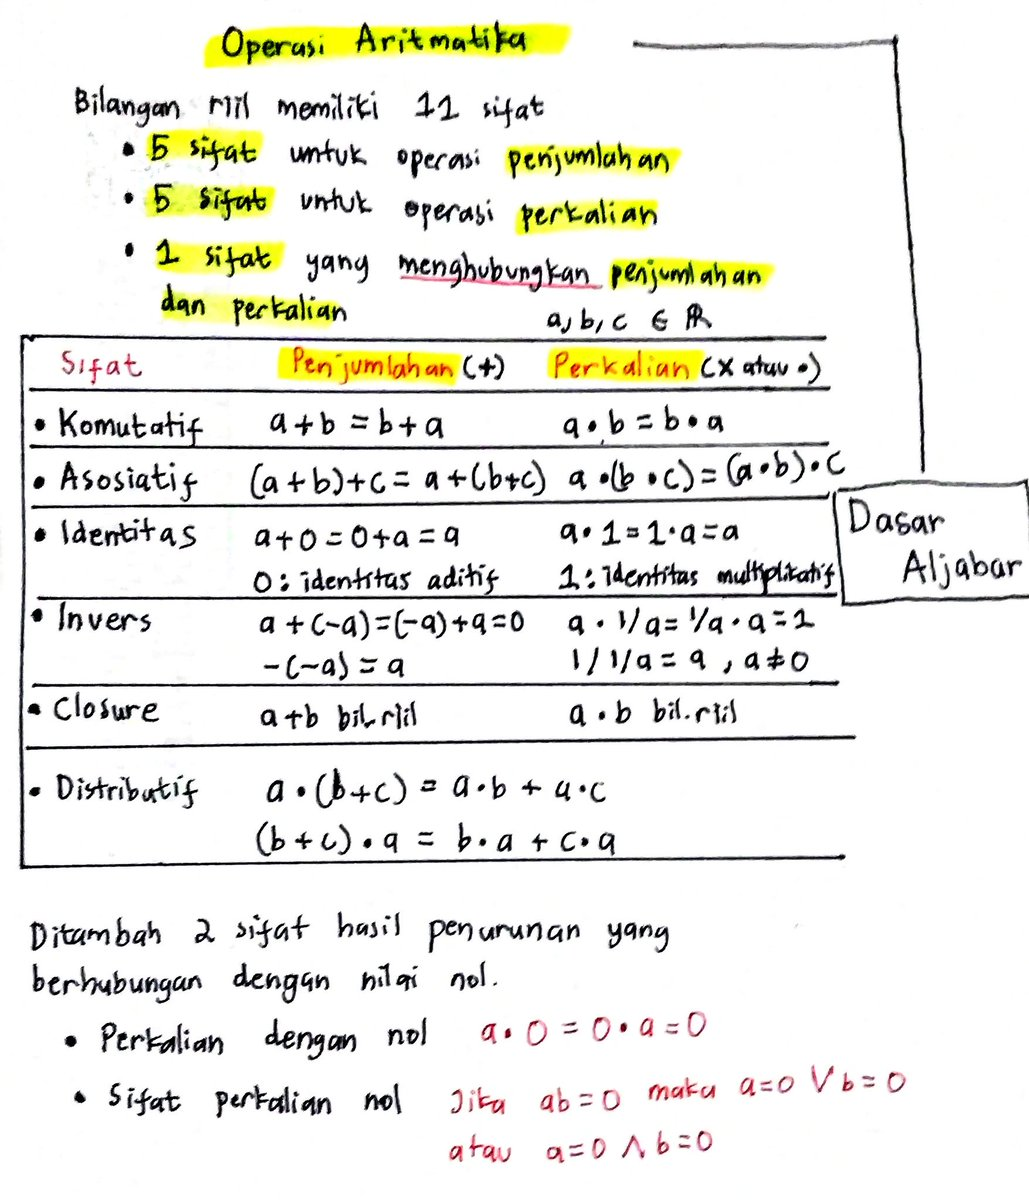 Immunobiology of natural killer